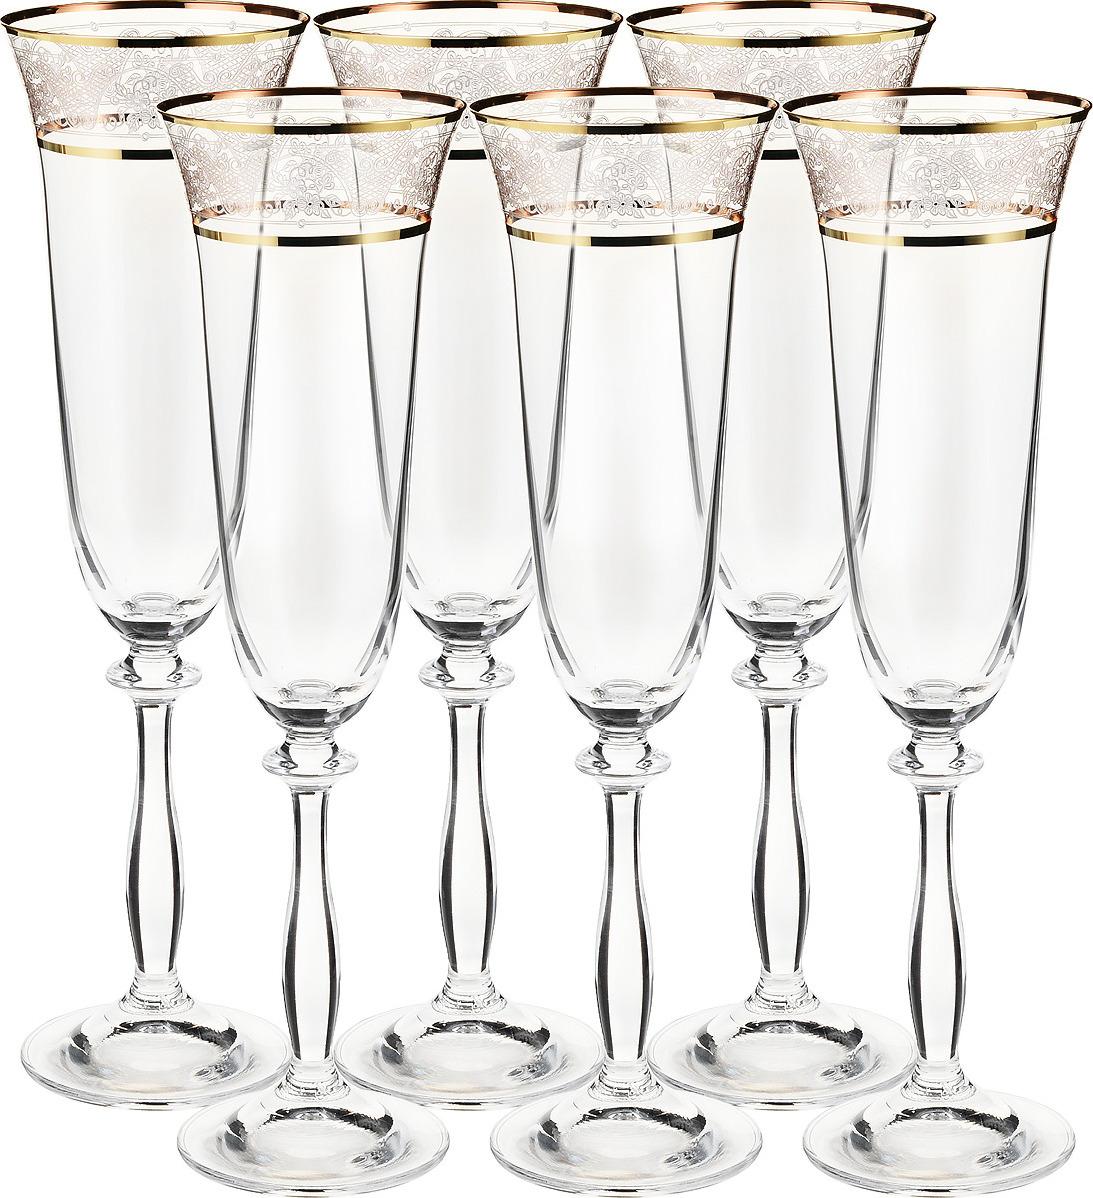 Набор бокалов для шампанского Bohemia Crystal Анжела, 190 мл, 6 шт. 40600/437586/190 набор бокалов для шампанского bohemia crystal оливия 190 мл 6 шт